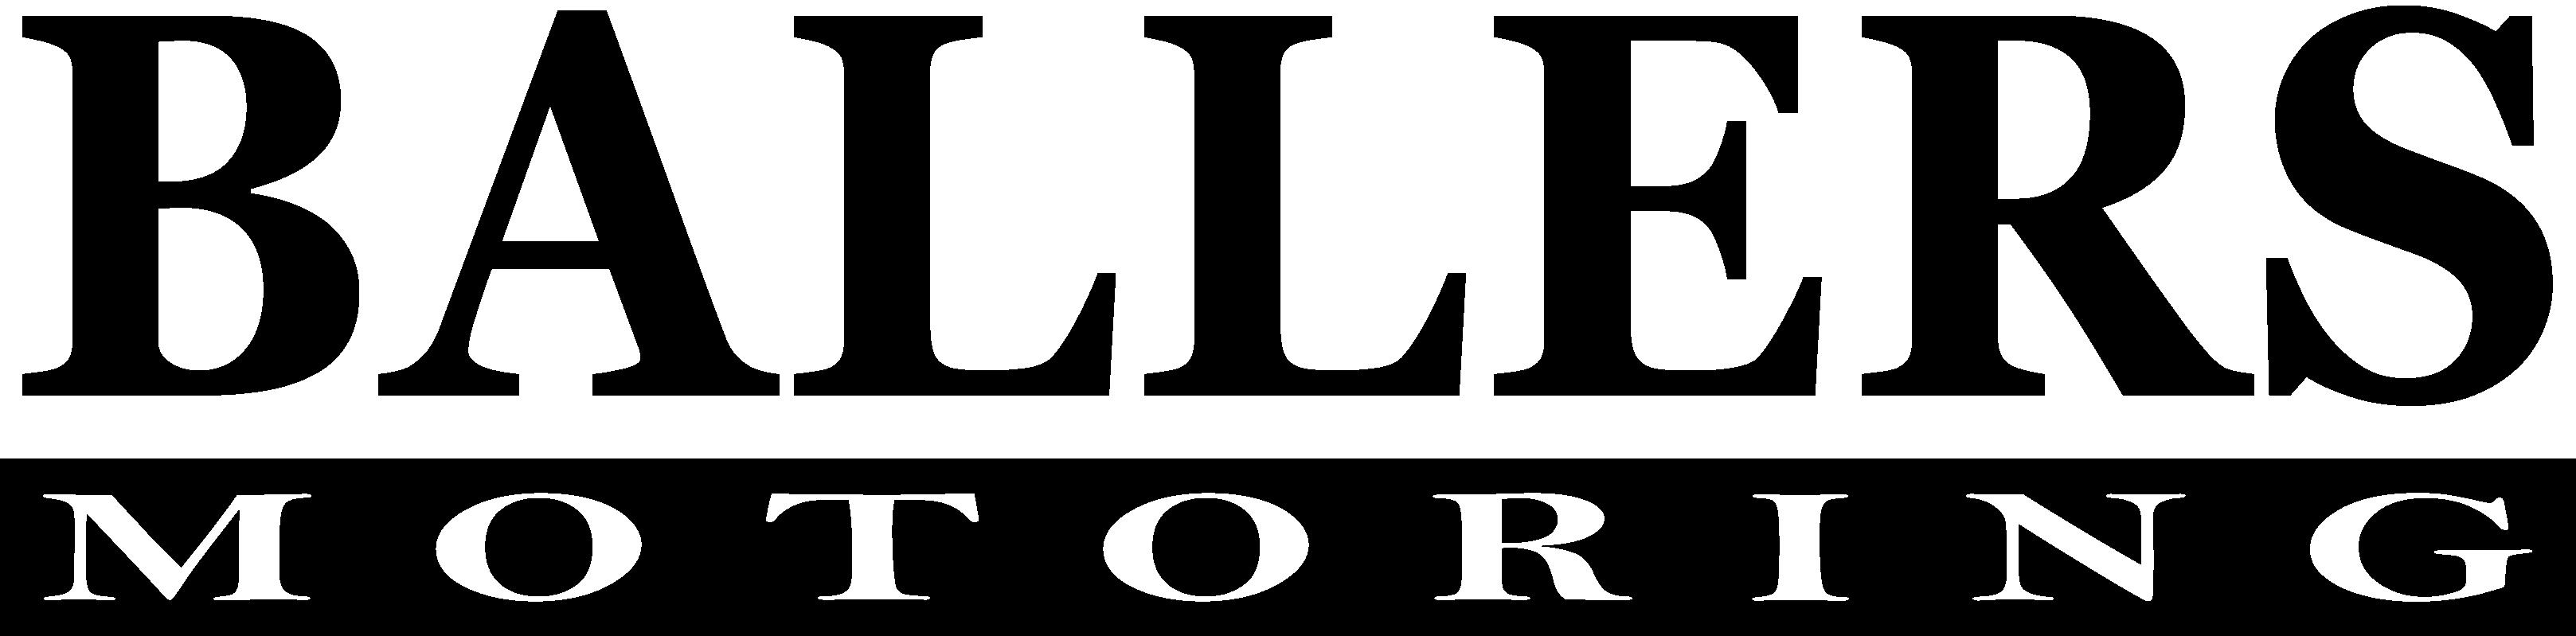 ballers_logo